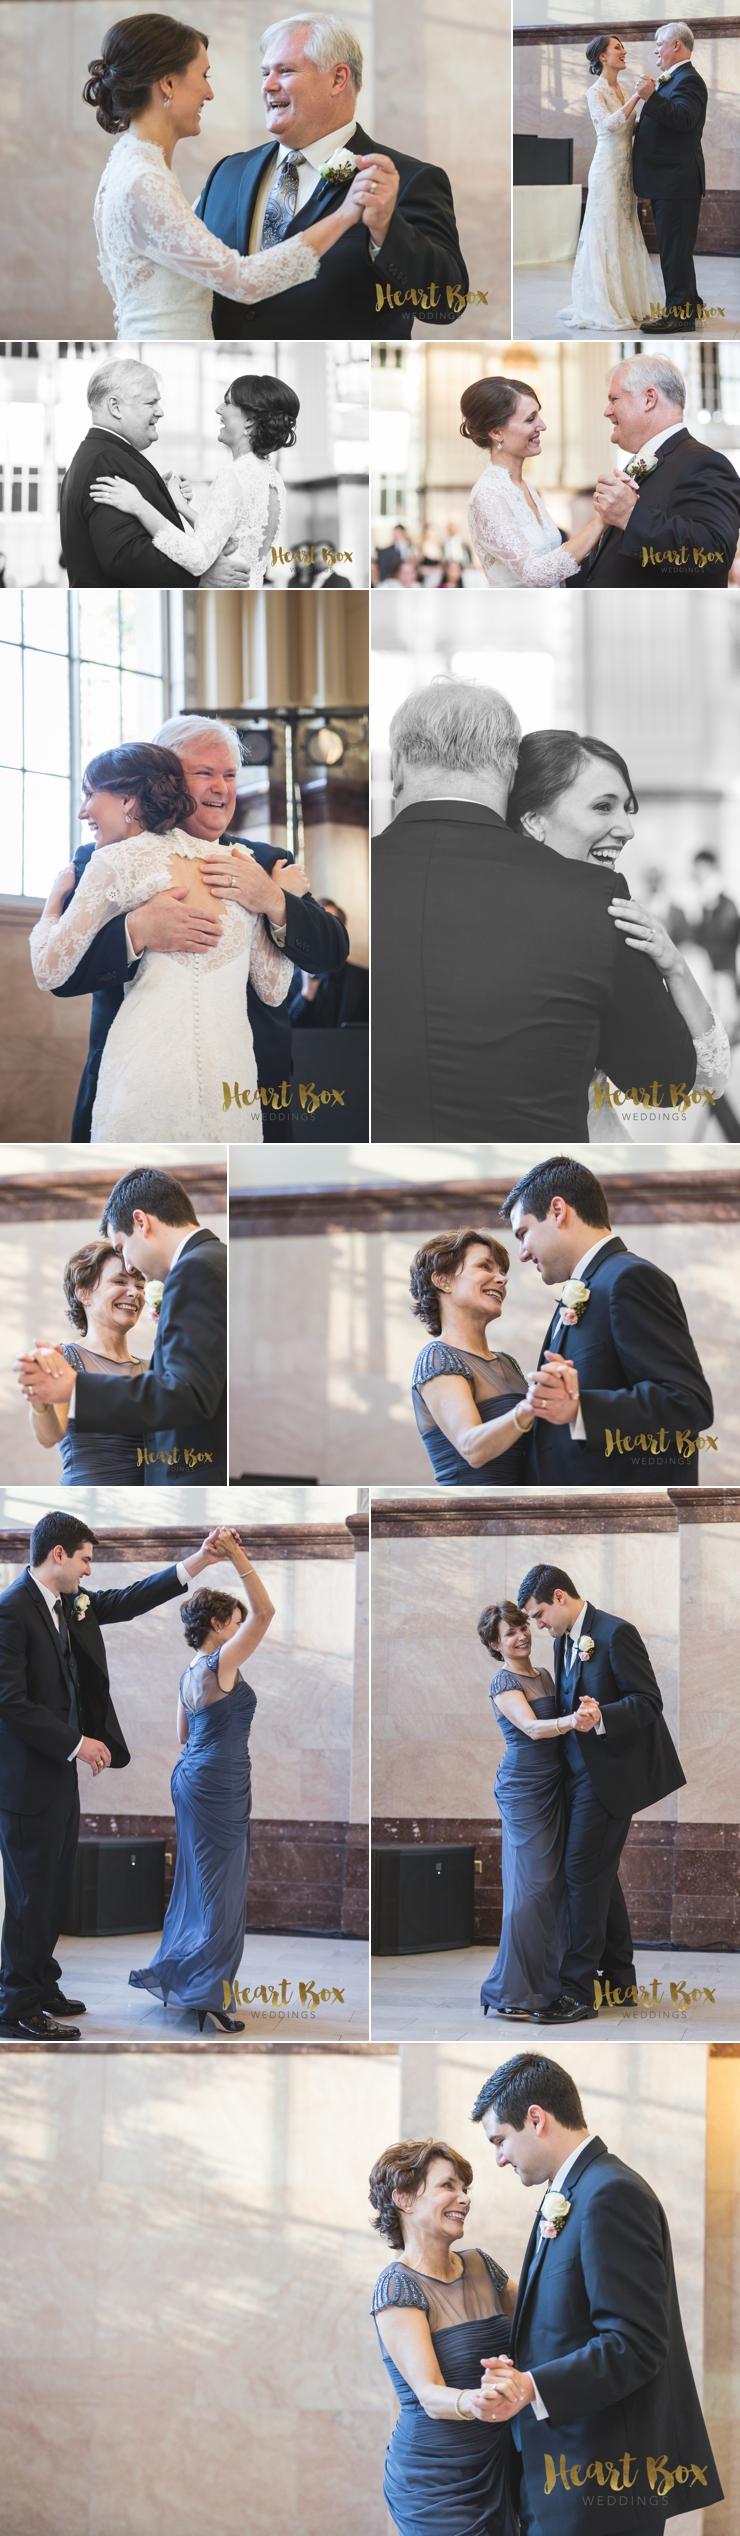 Fegan Wedding Blog Collages 16.jpg